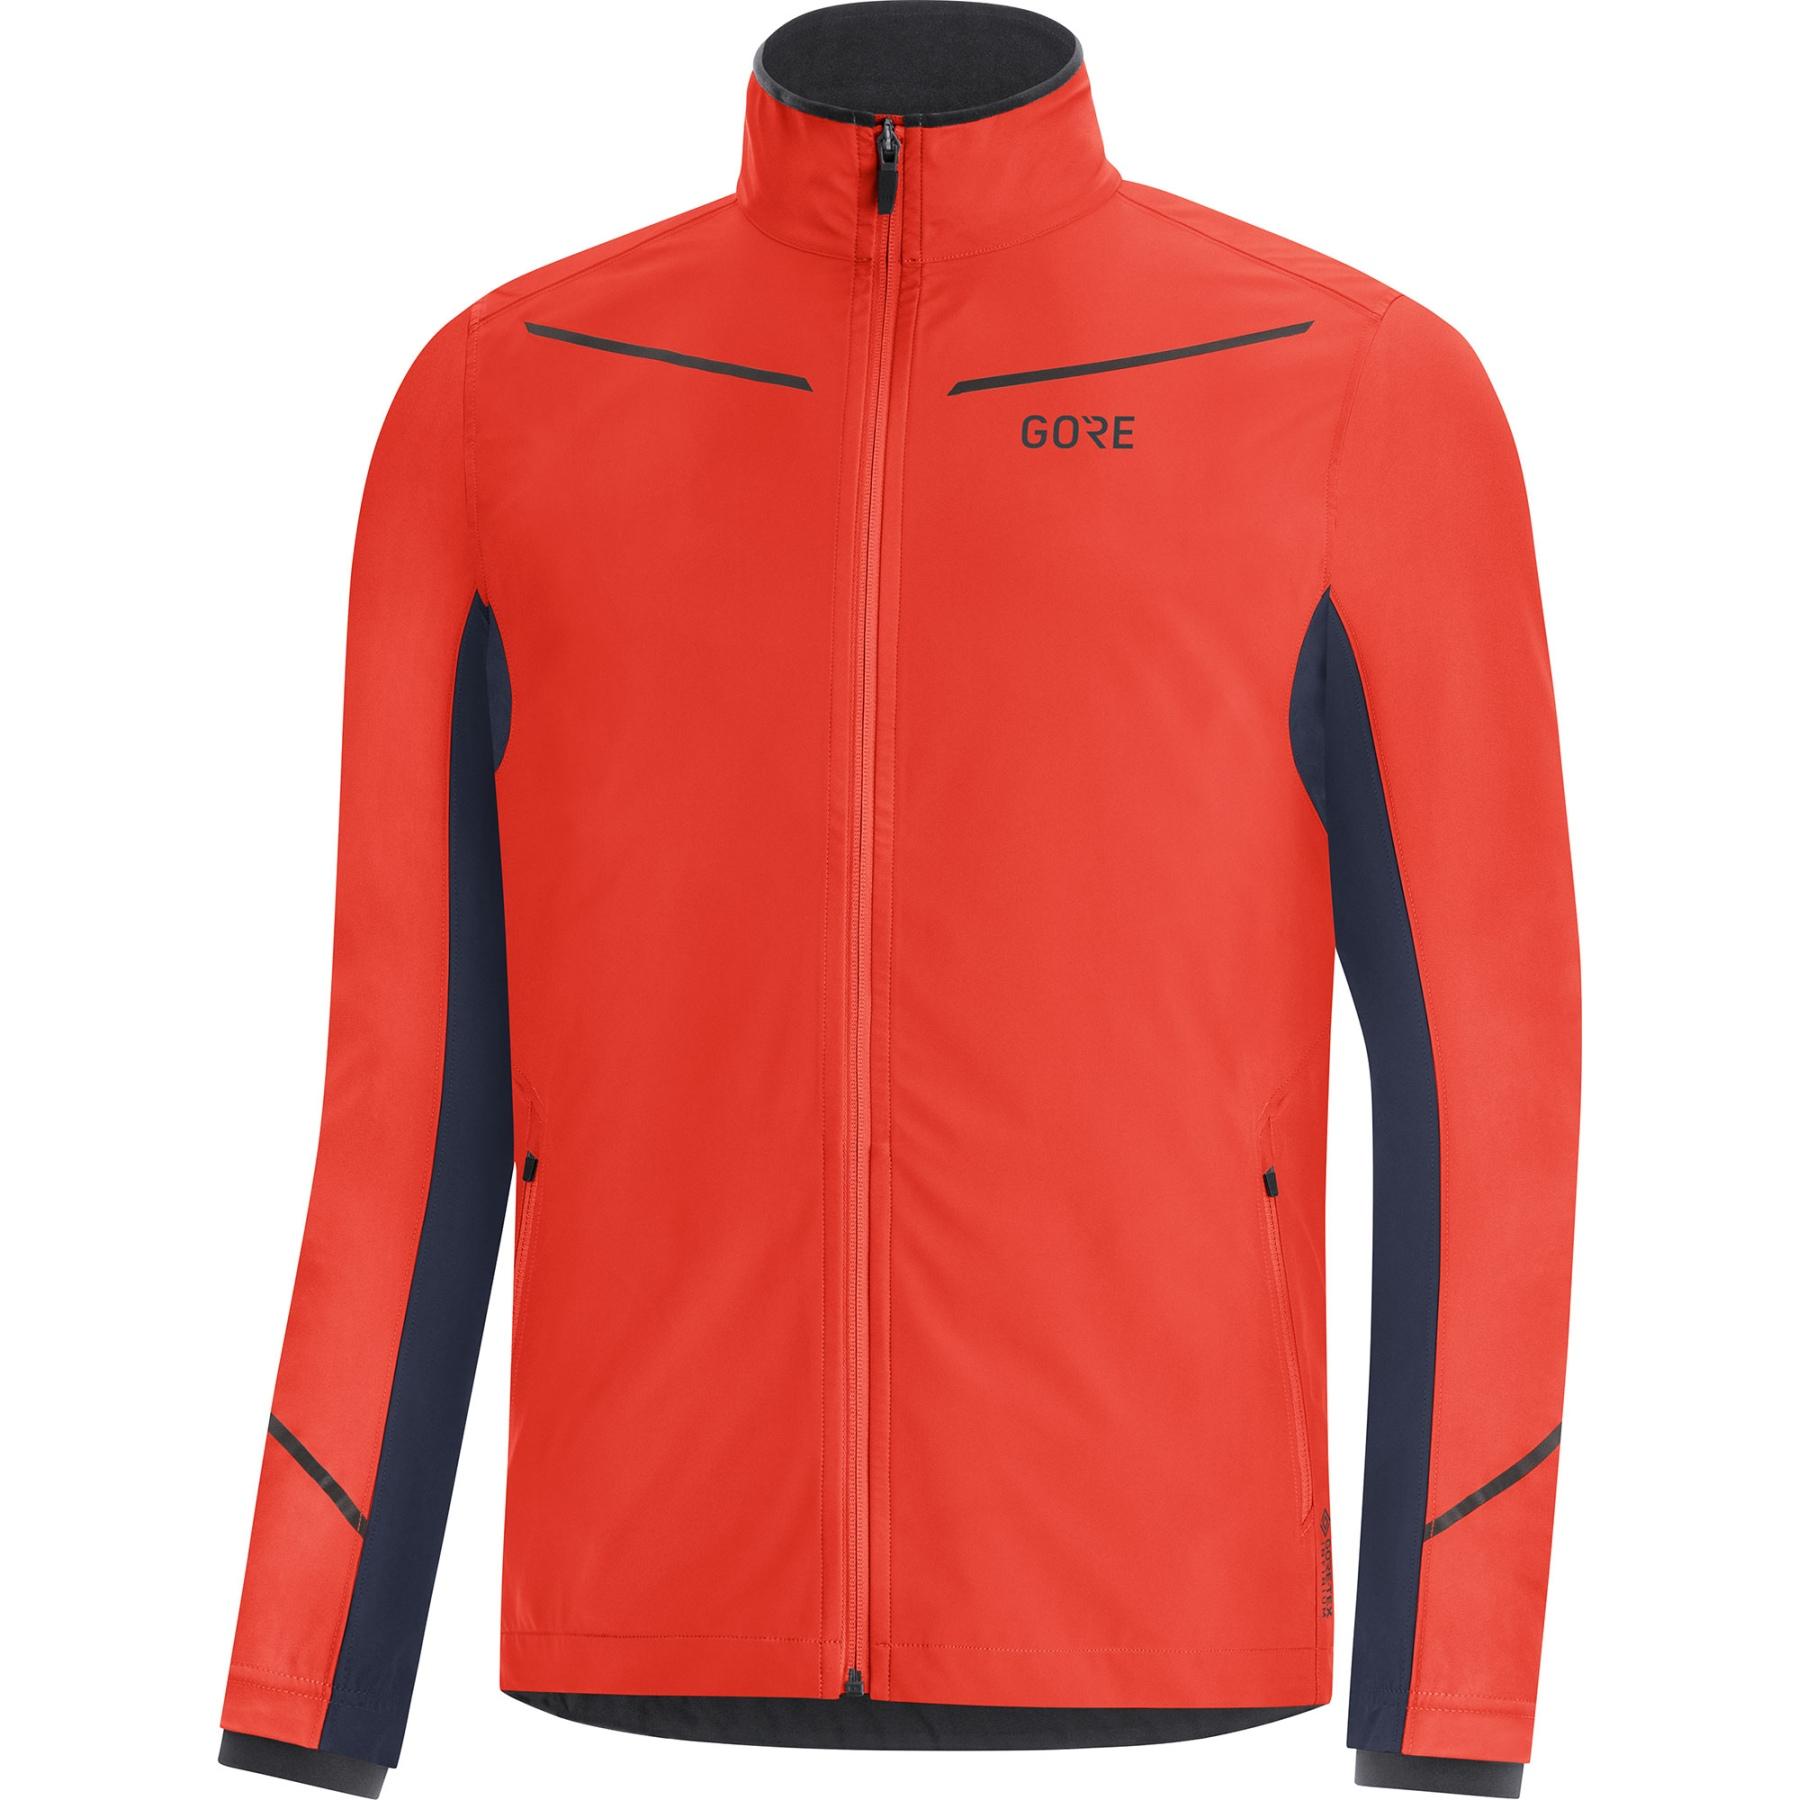 GORE Wear R3 GORE-TEX INFINIUM™ Partial Jacke - fireball/orbit blue AYAU